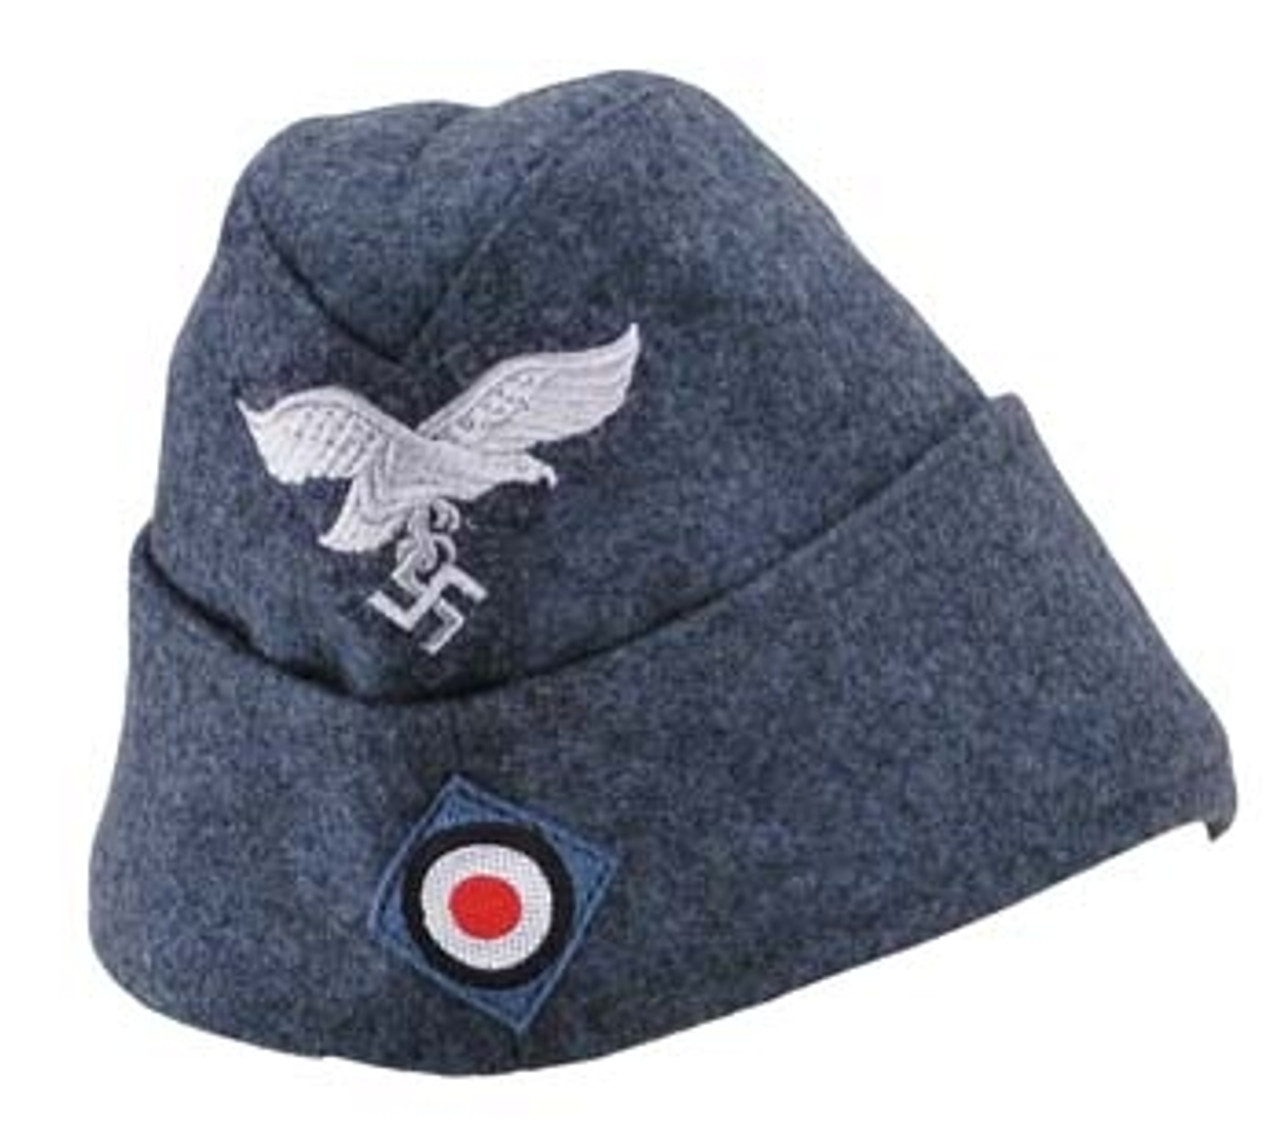 Luftwaffe Enlisted M40 Field cap from Hessen Antique